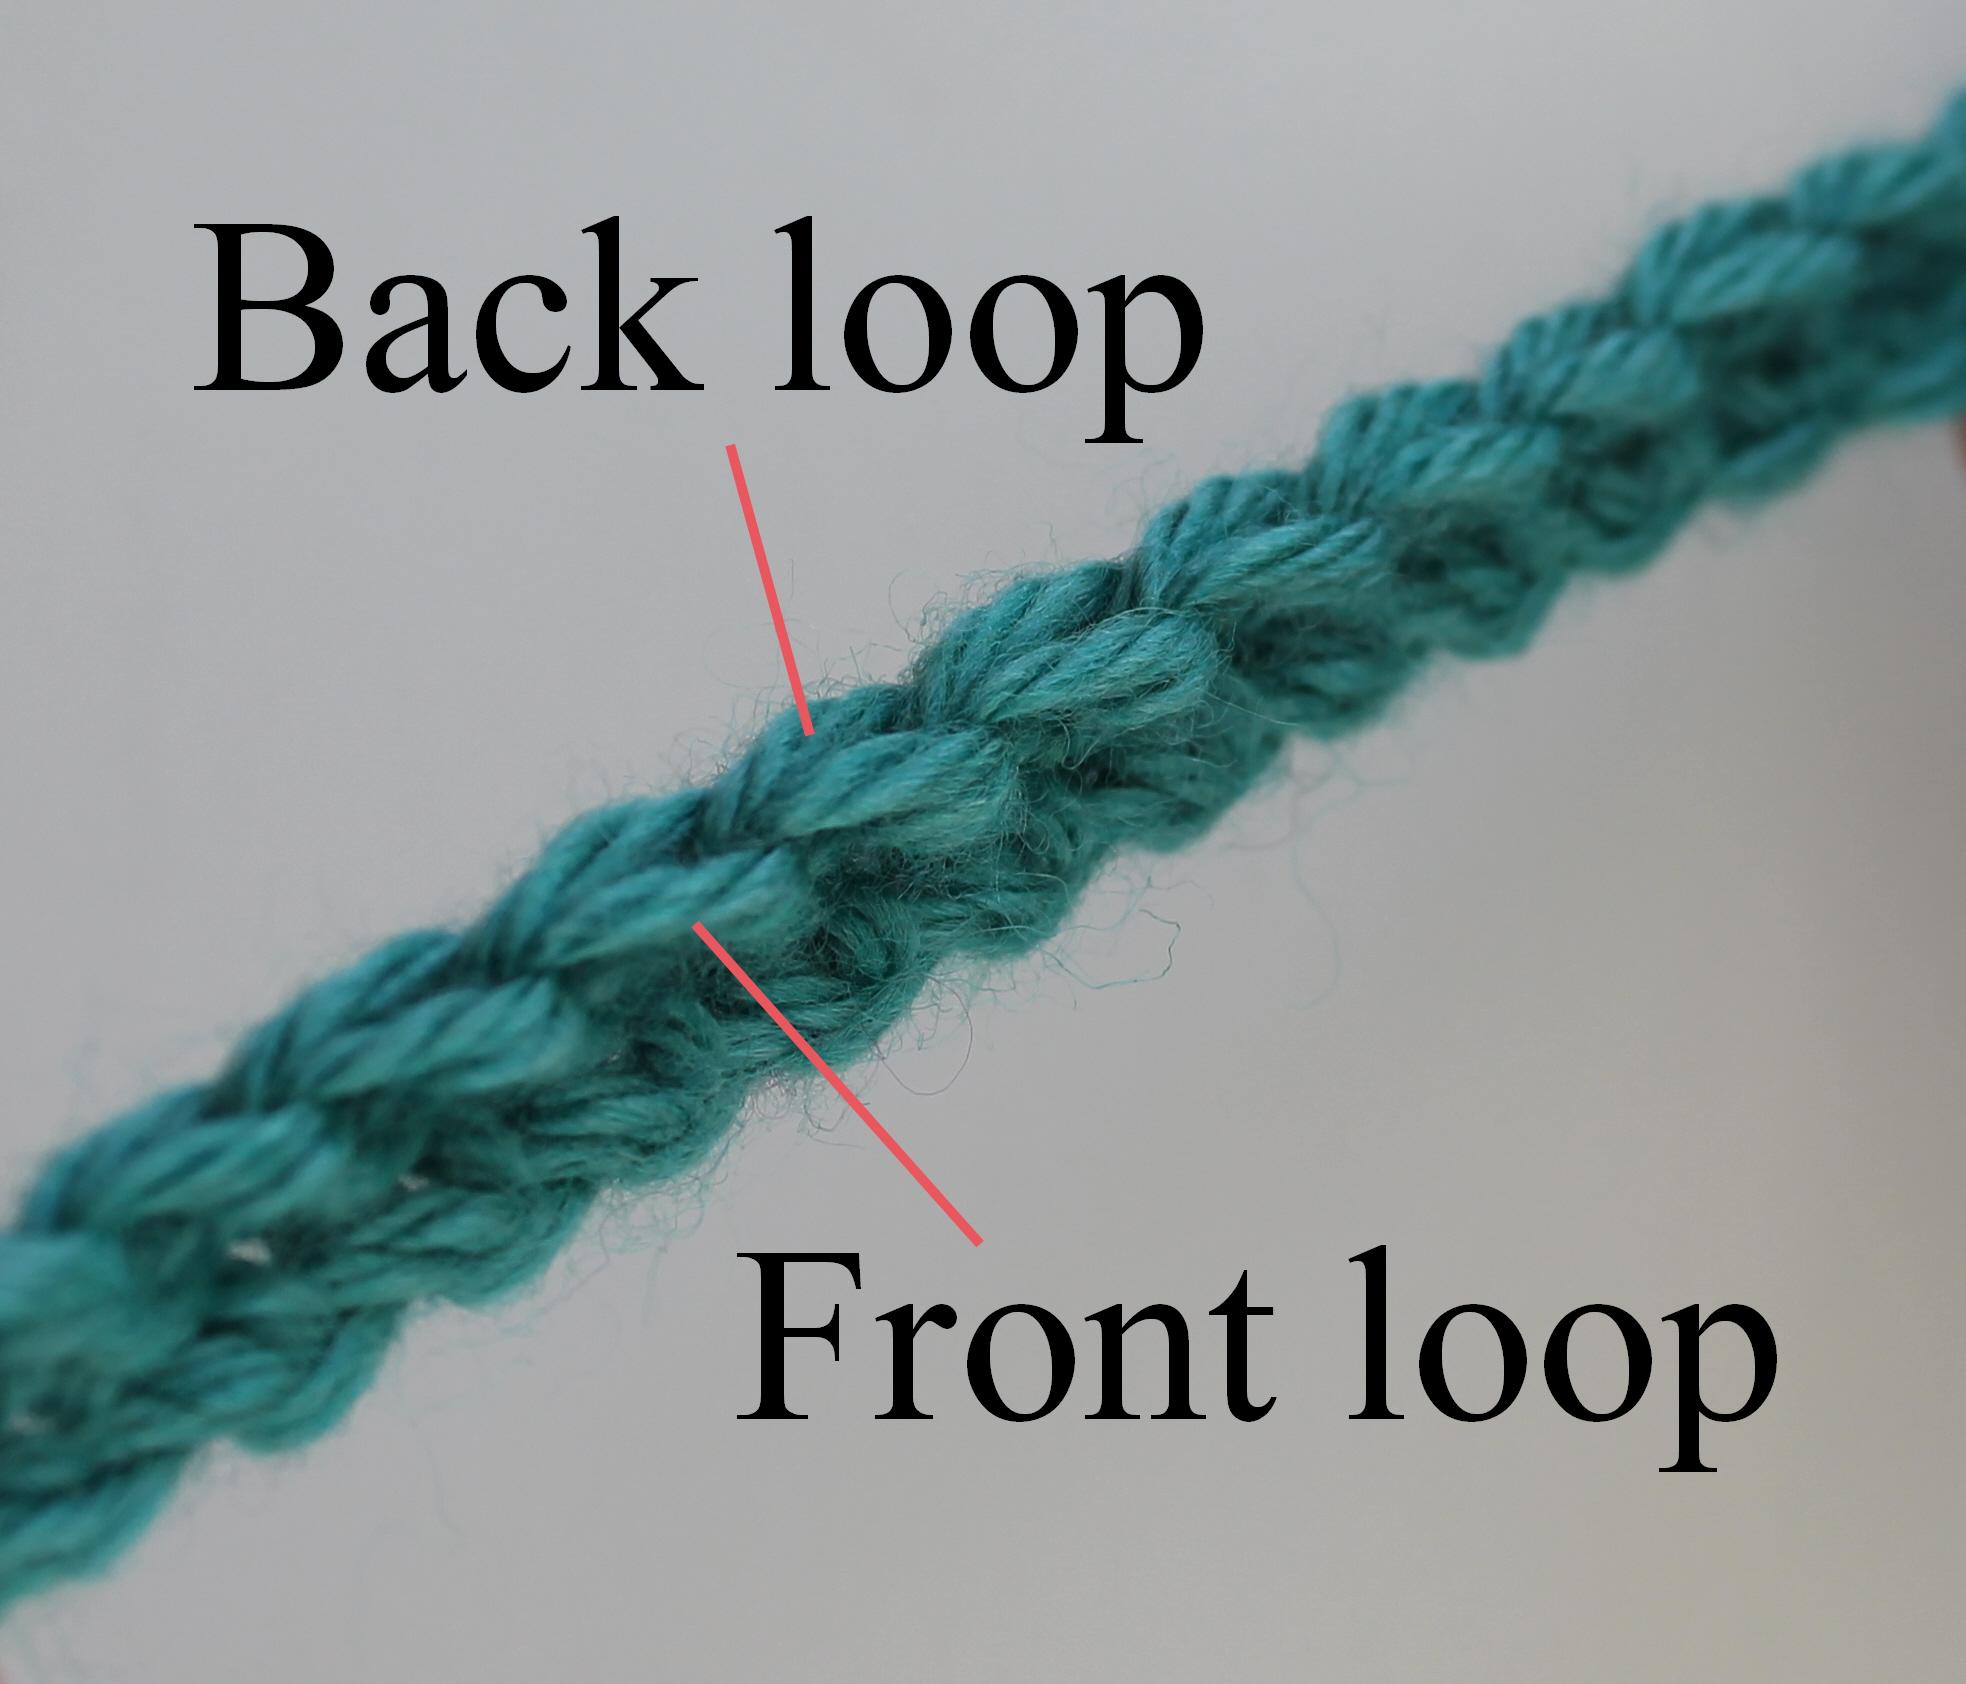 Back loop stitch